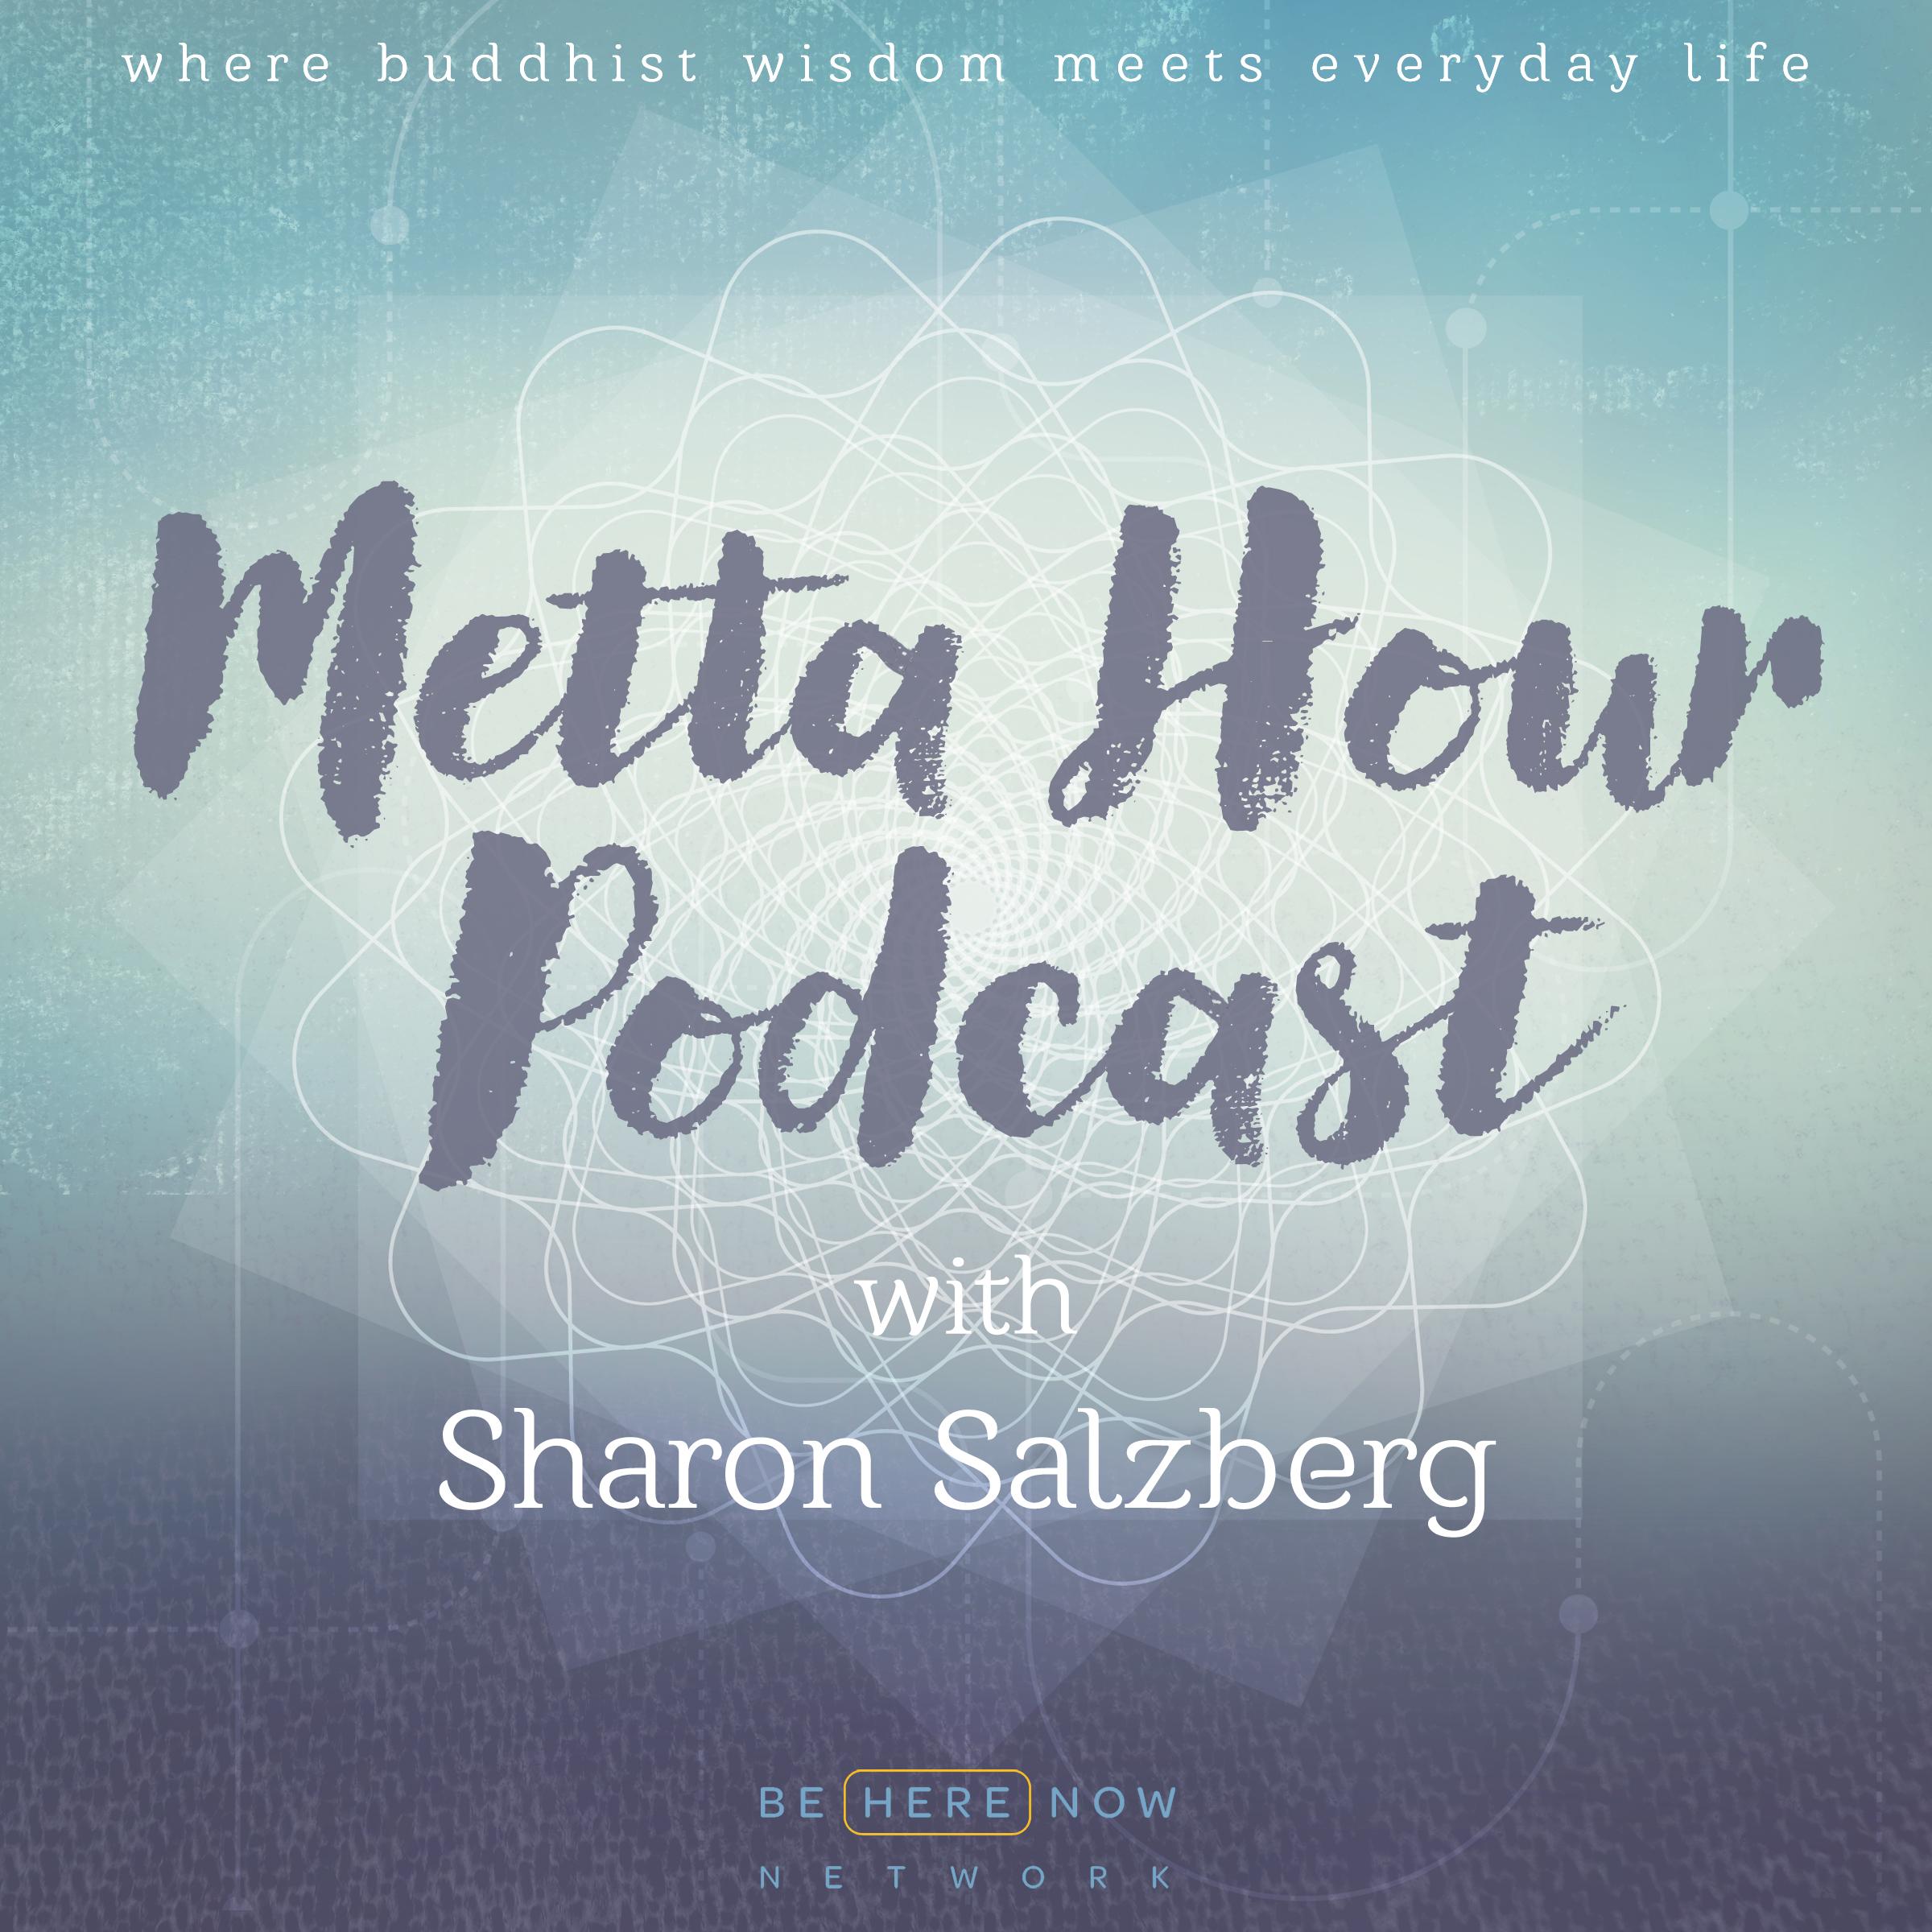 Metta hour Podcast Sharon Salzberg